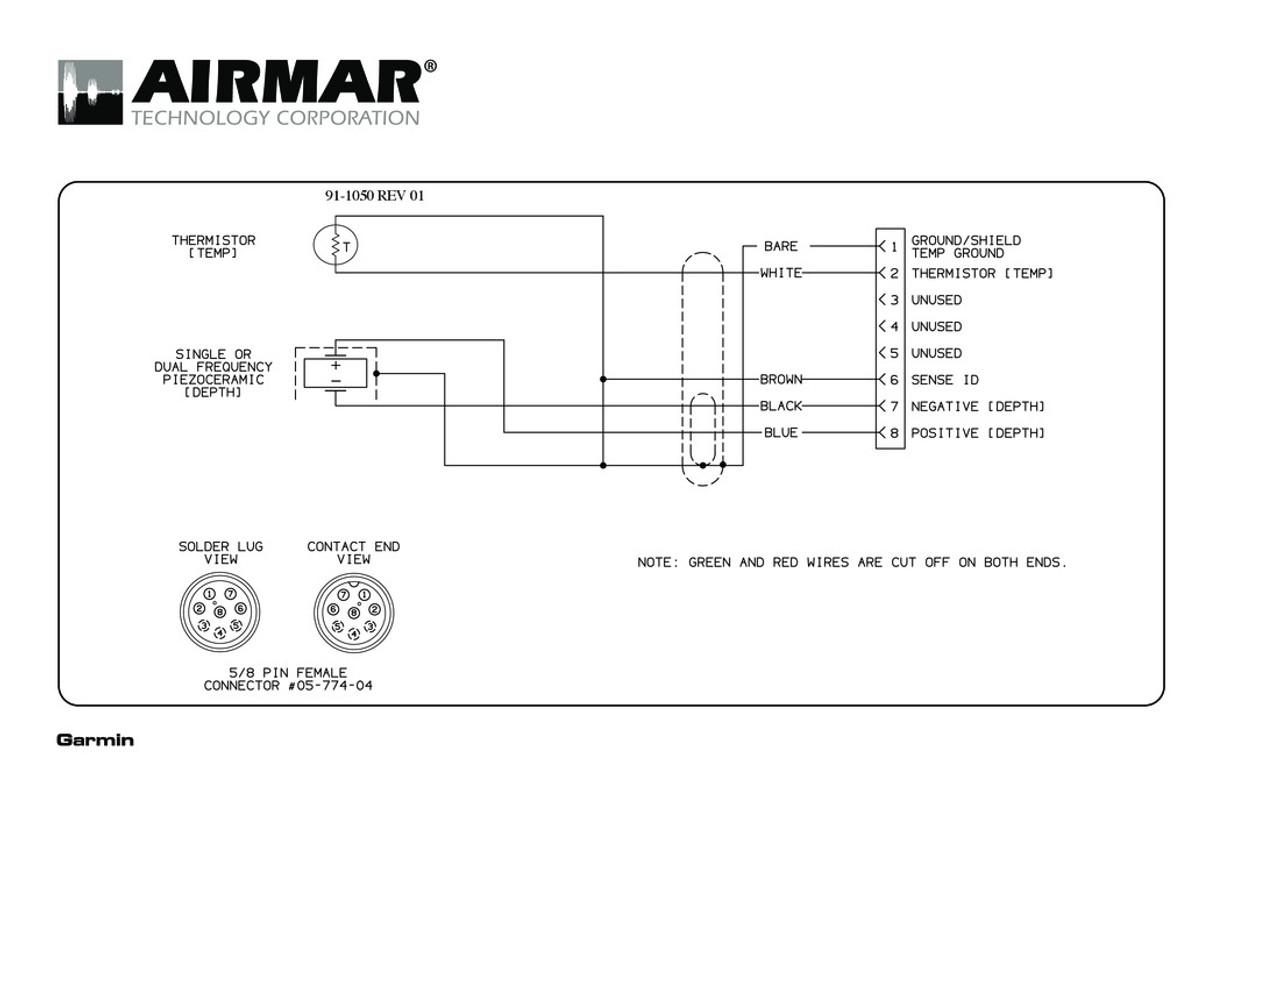 Garmin Mini Usb Wiring Diagram - Electricity Site on